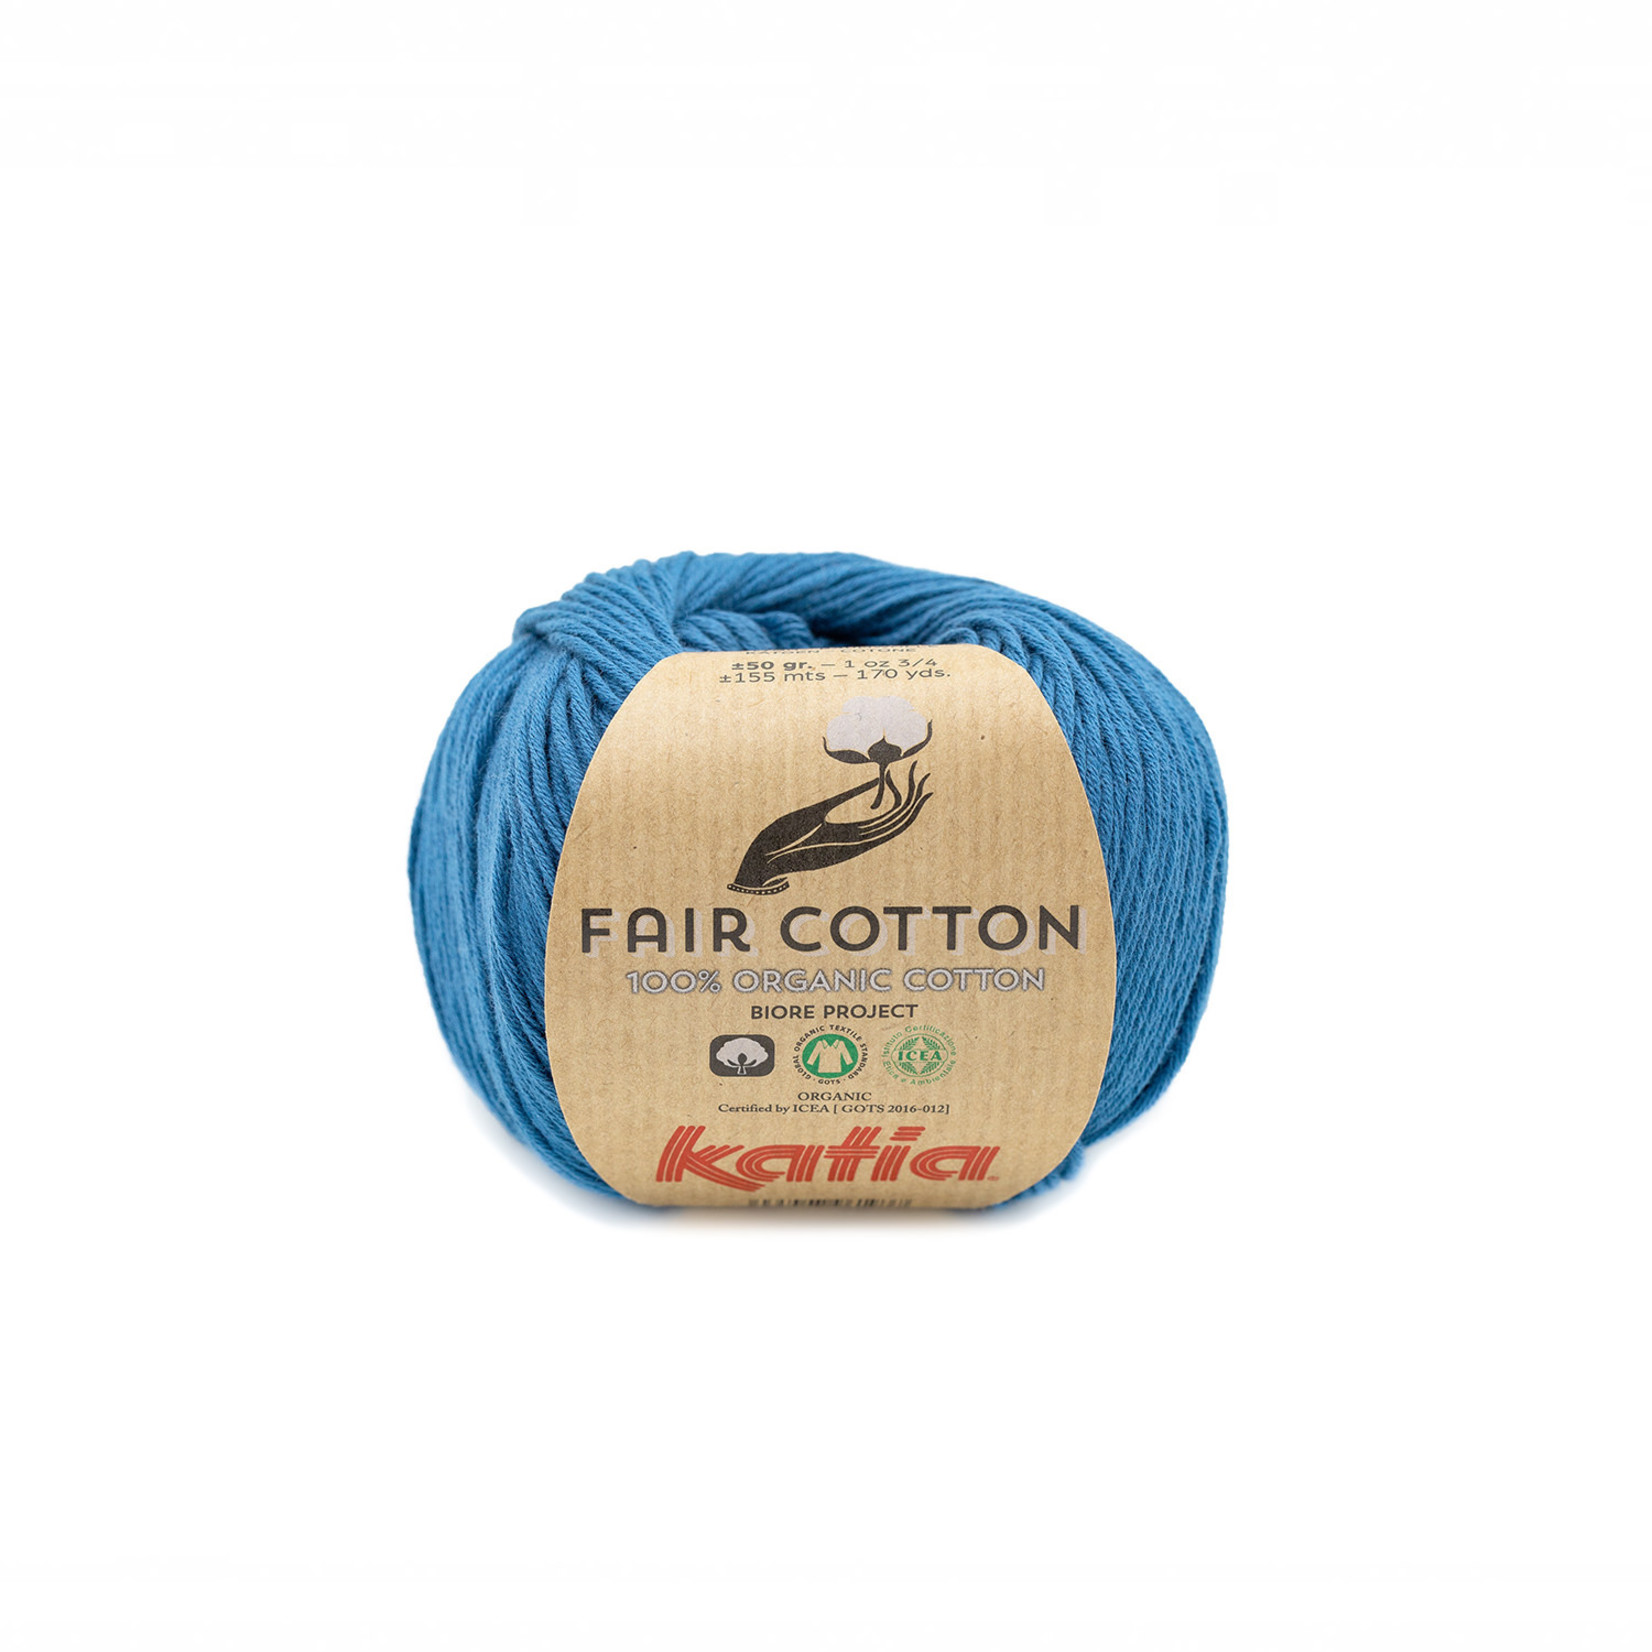 Katia Katia Fair Cotton 38 - groenblauw - 1 bol = 50 gr. = 155 m. - 100% biol. katoen